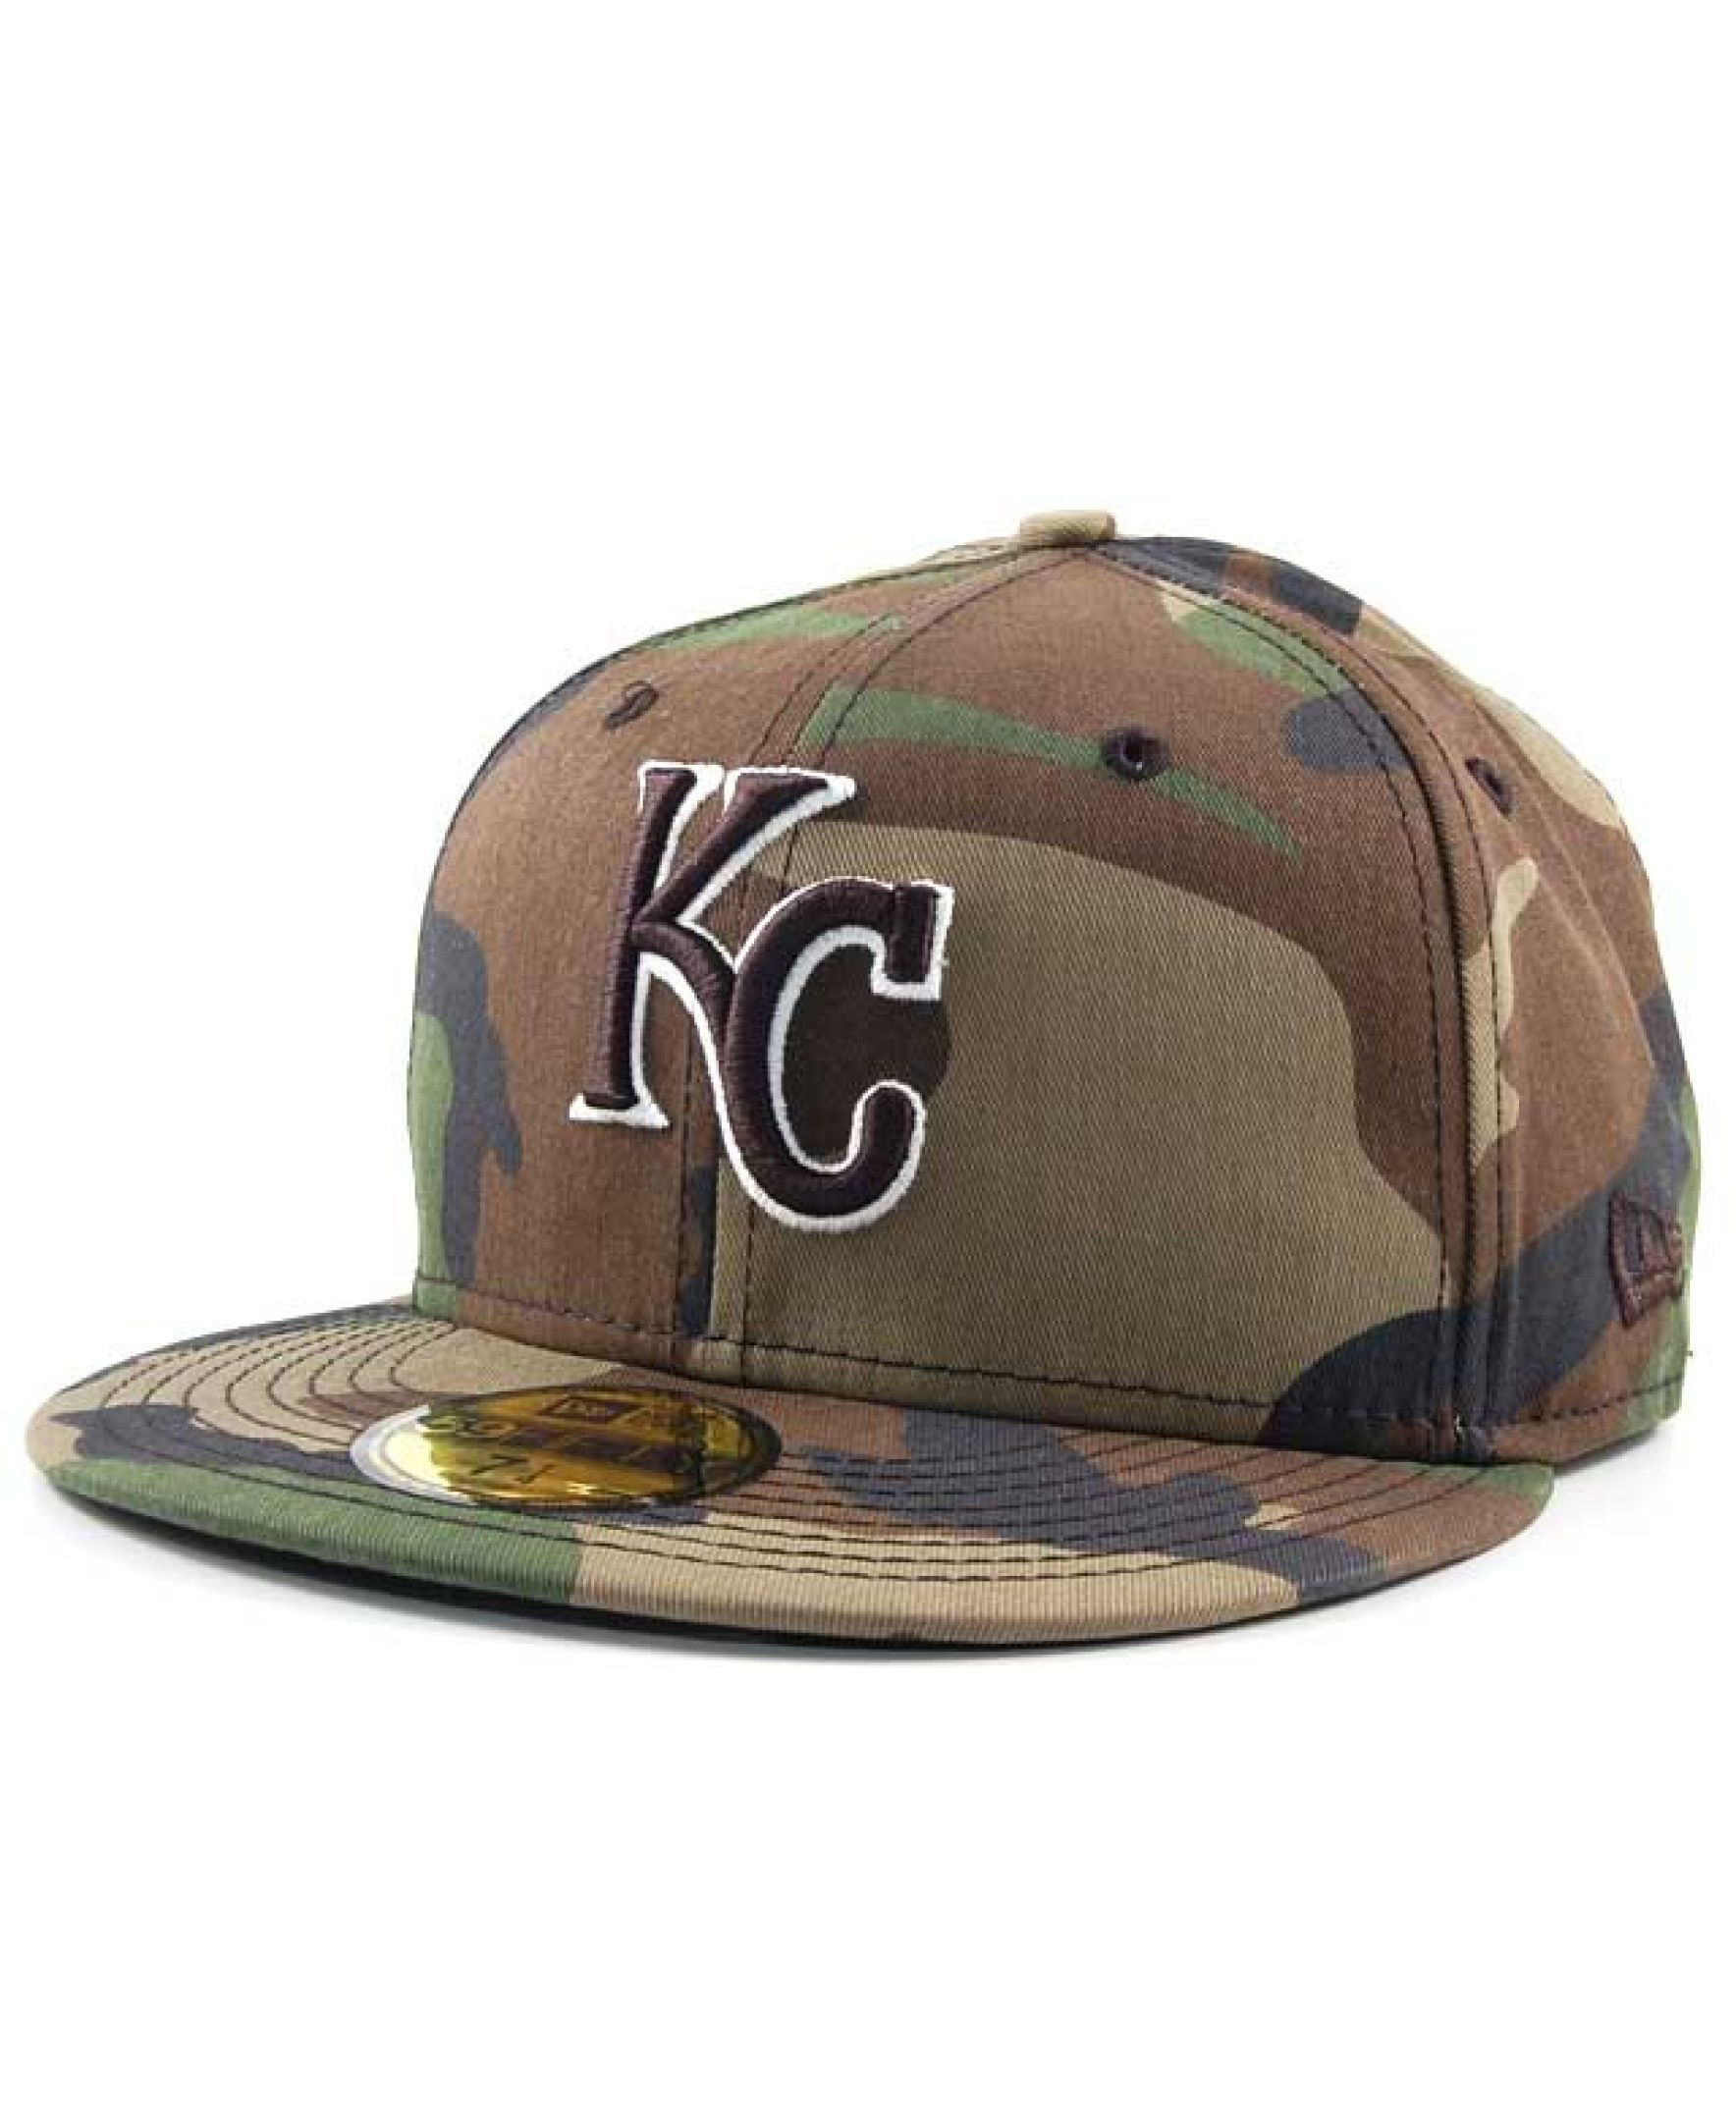 New Era Kansas City Bc Camo 59FIFTY Cap  4a5b3d8b60b